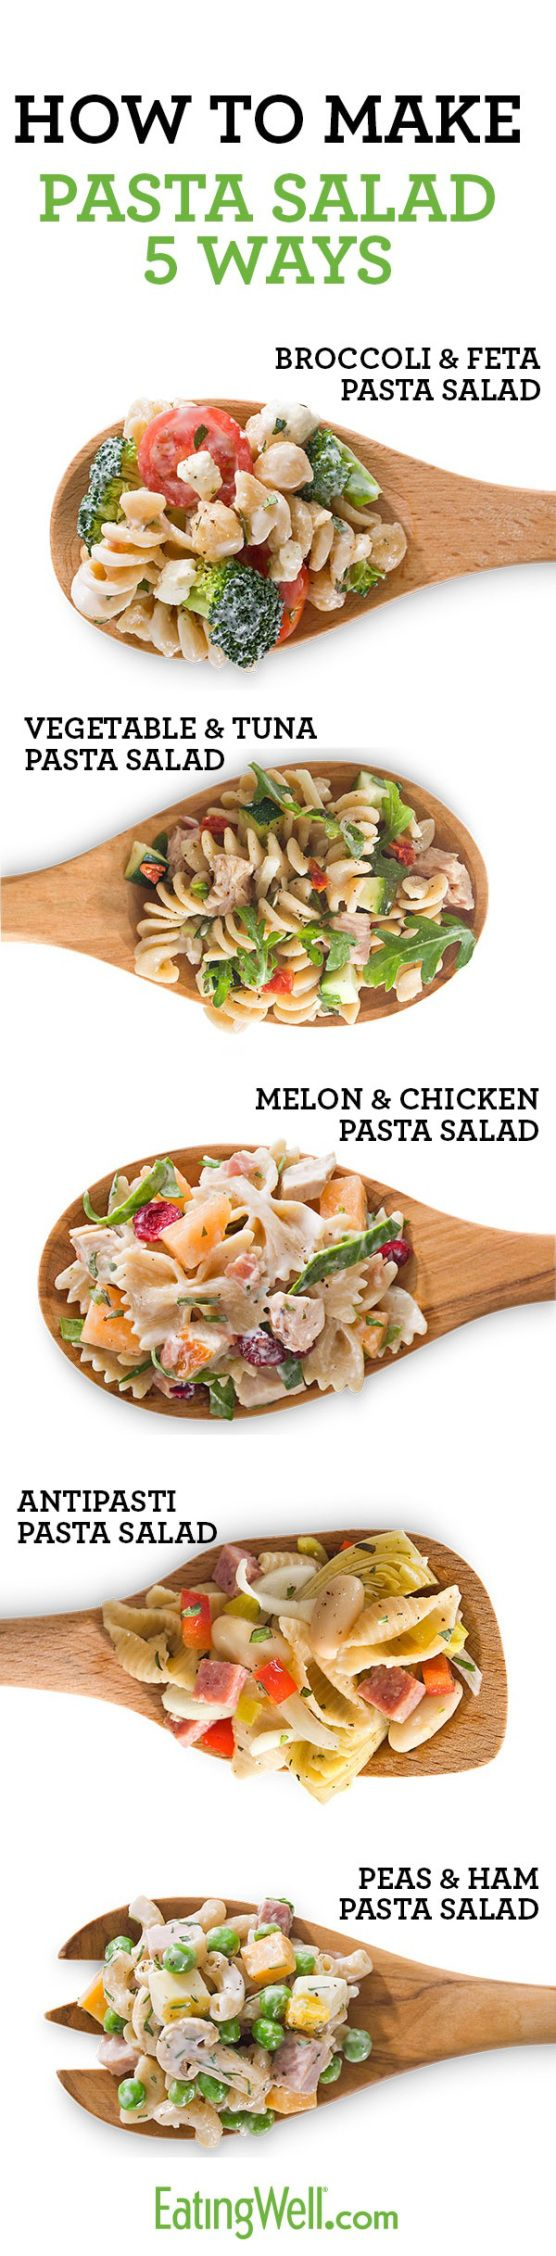 how to make tuna mornay pasta